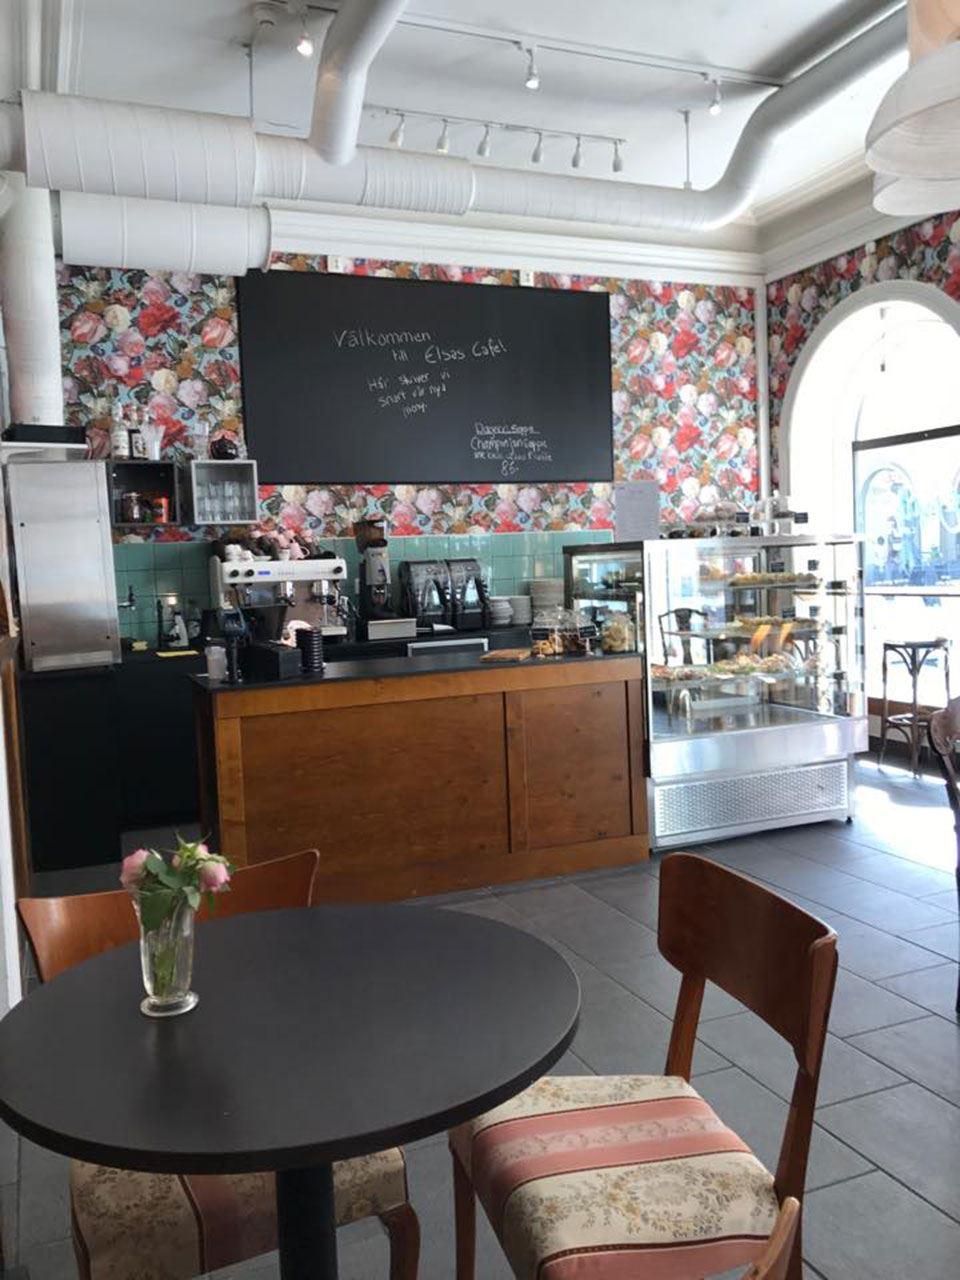 Elsa's café